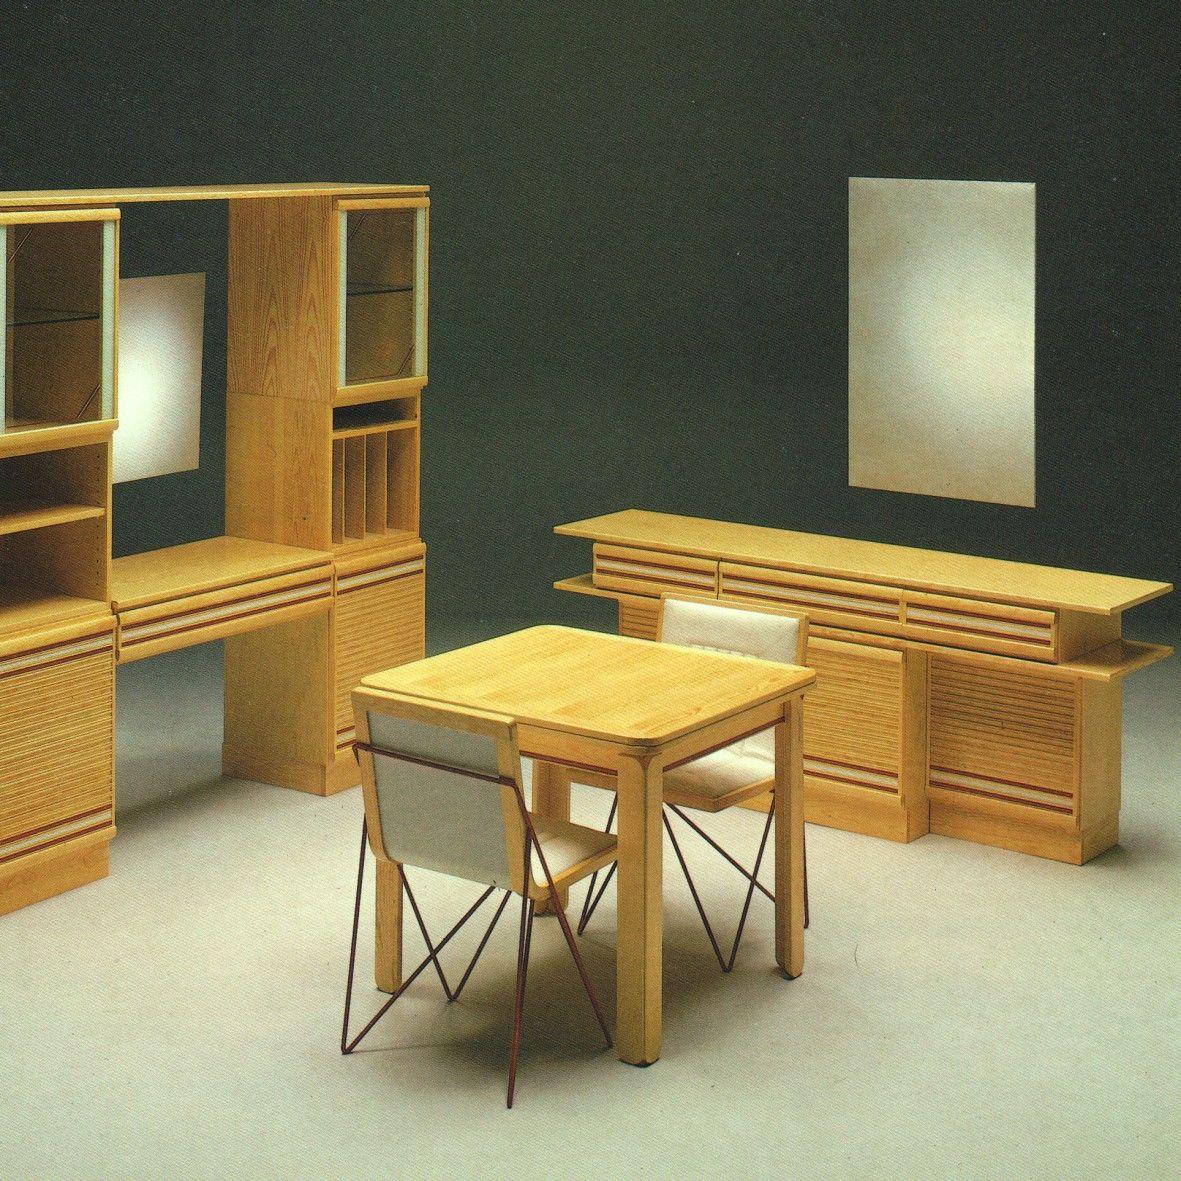 Dise o industrial programa juvenil halley majadas for Programa para disenar muebles de madera